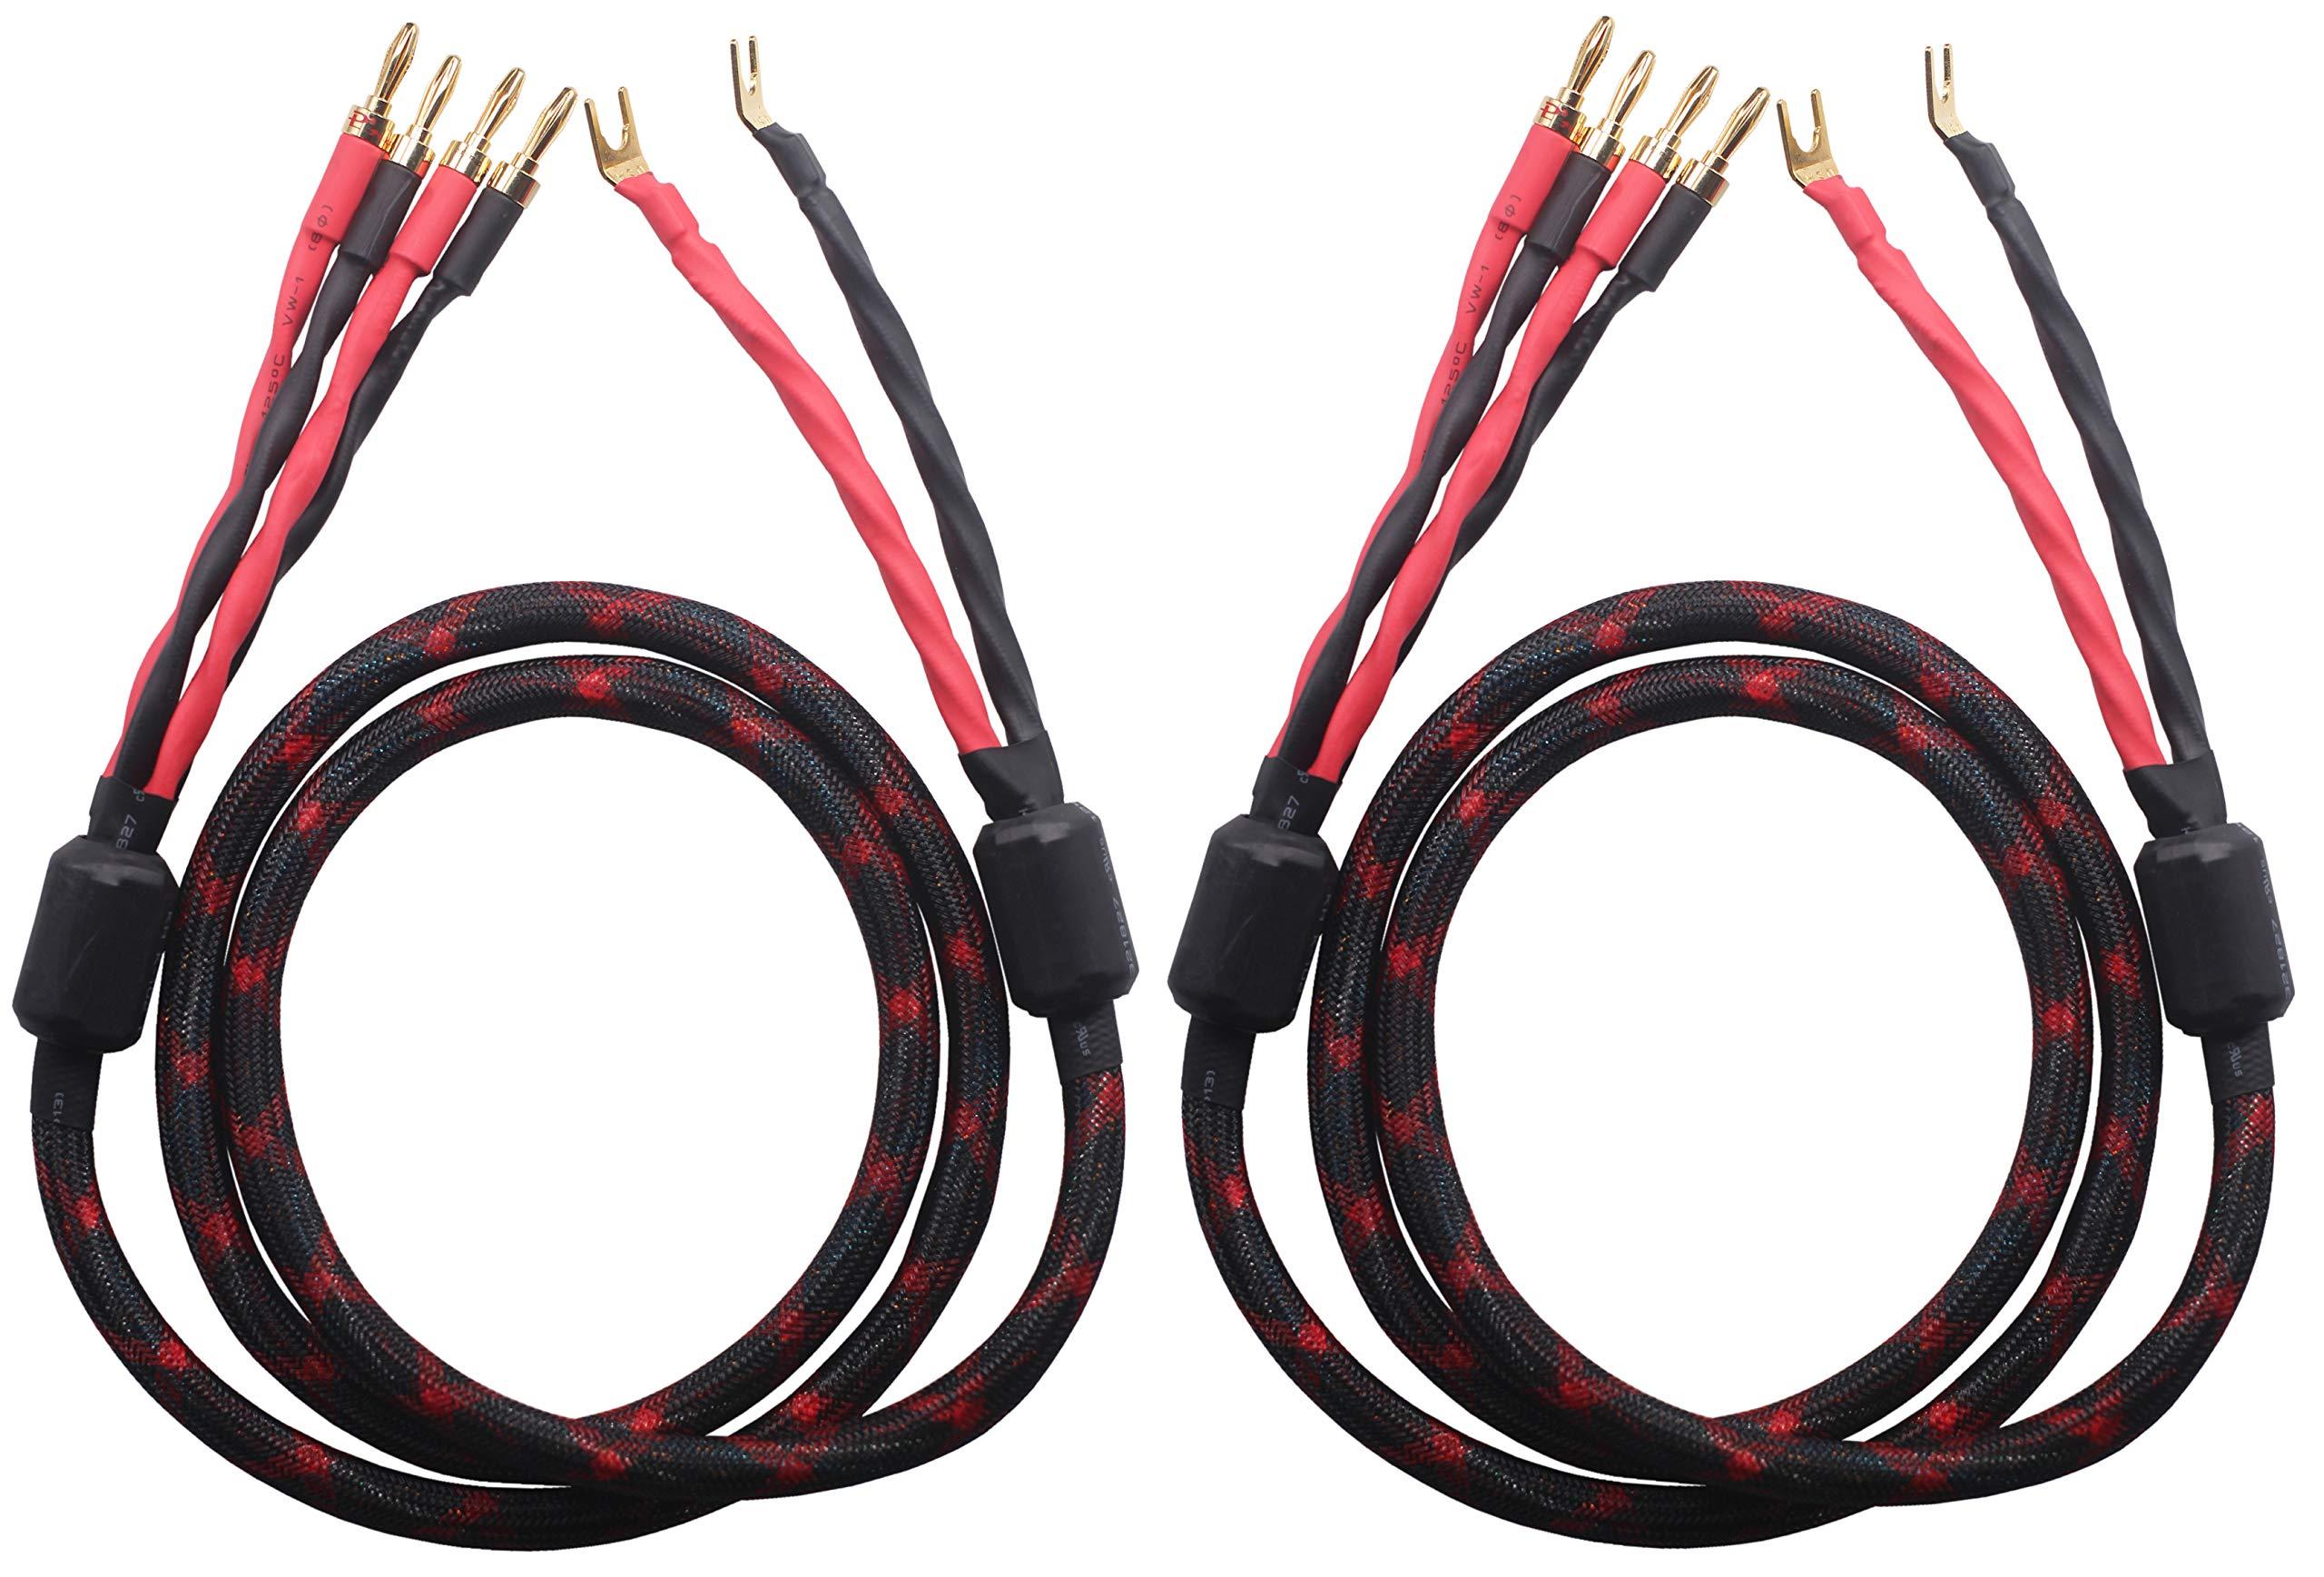 KK Cable K2Y-4B Bi-Wire Speaker Cable (4 Banana plugs - 2 Spade plugs), 1pair set (Total 8 Banana plugs, 4 Spade plugs), K2Y-4B. (1.5M(4.92ft))